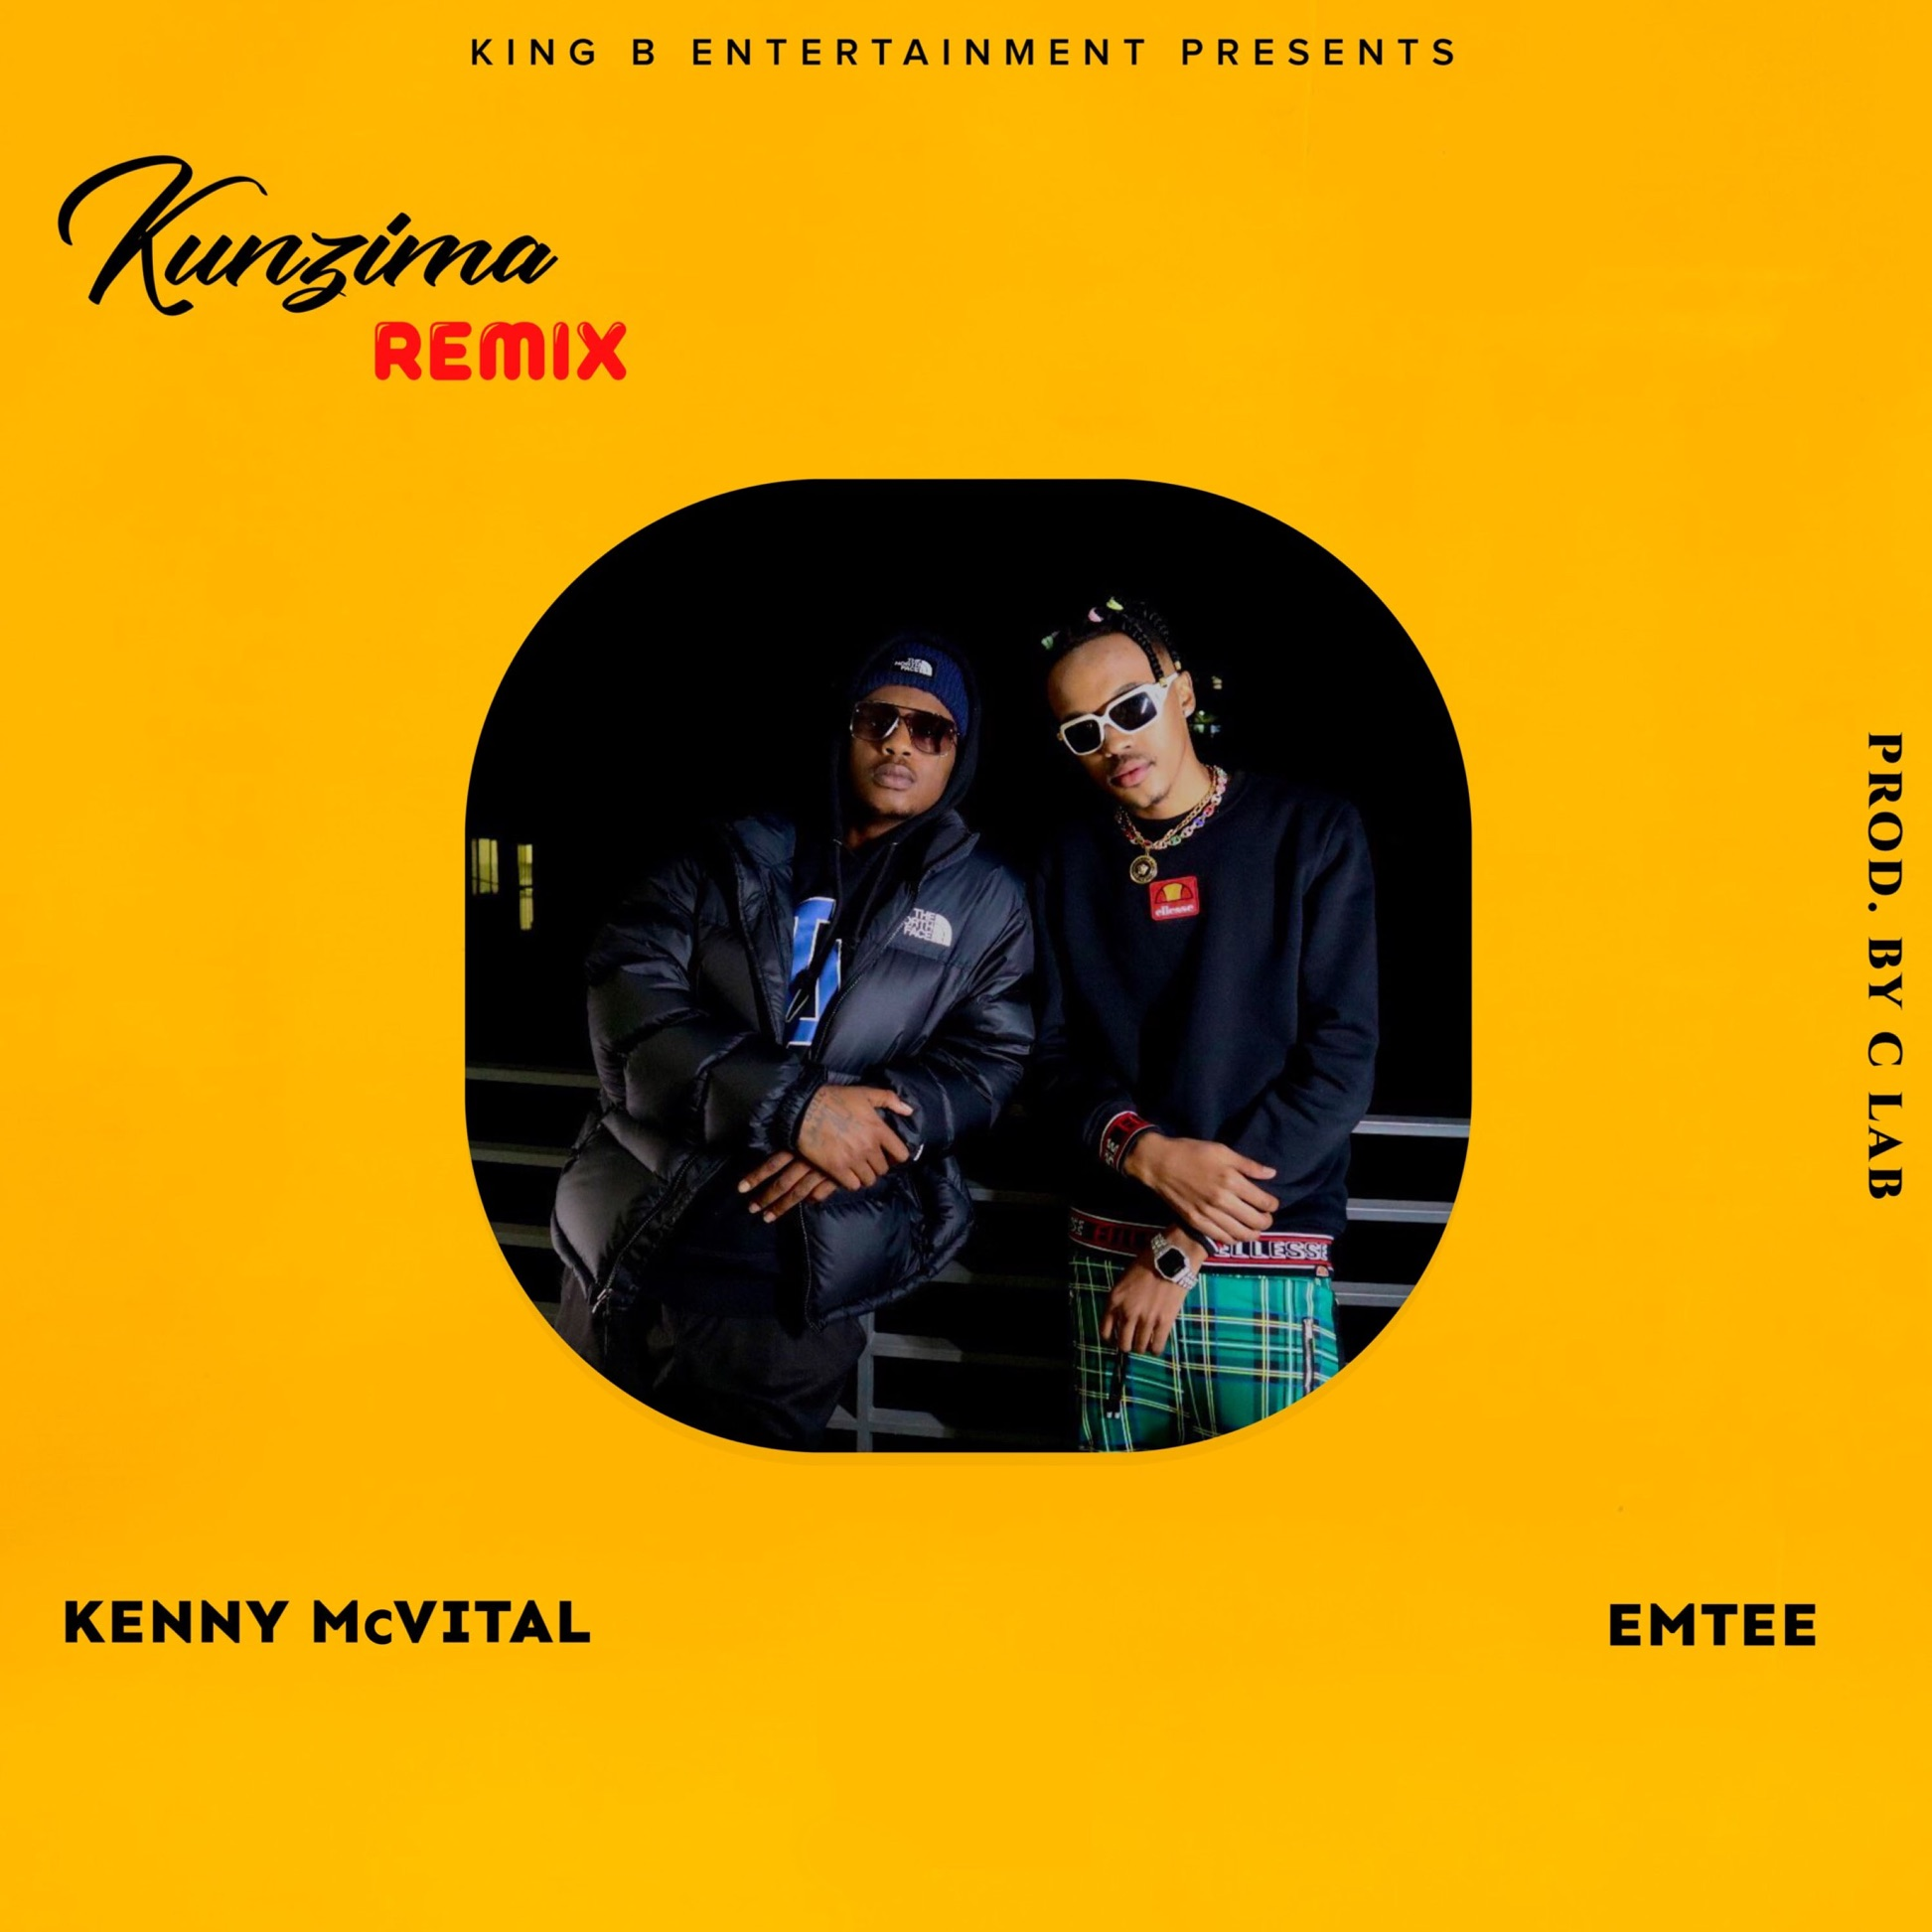 Kenny McVital – Kunzima (Remix) Ft. Emtee mp3 download